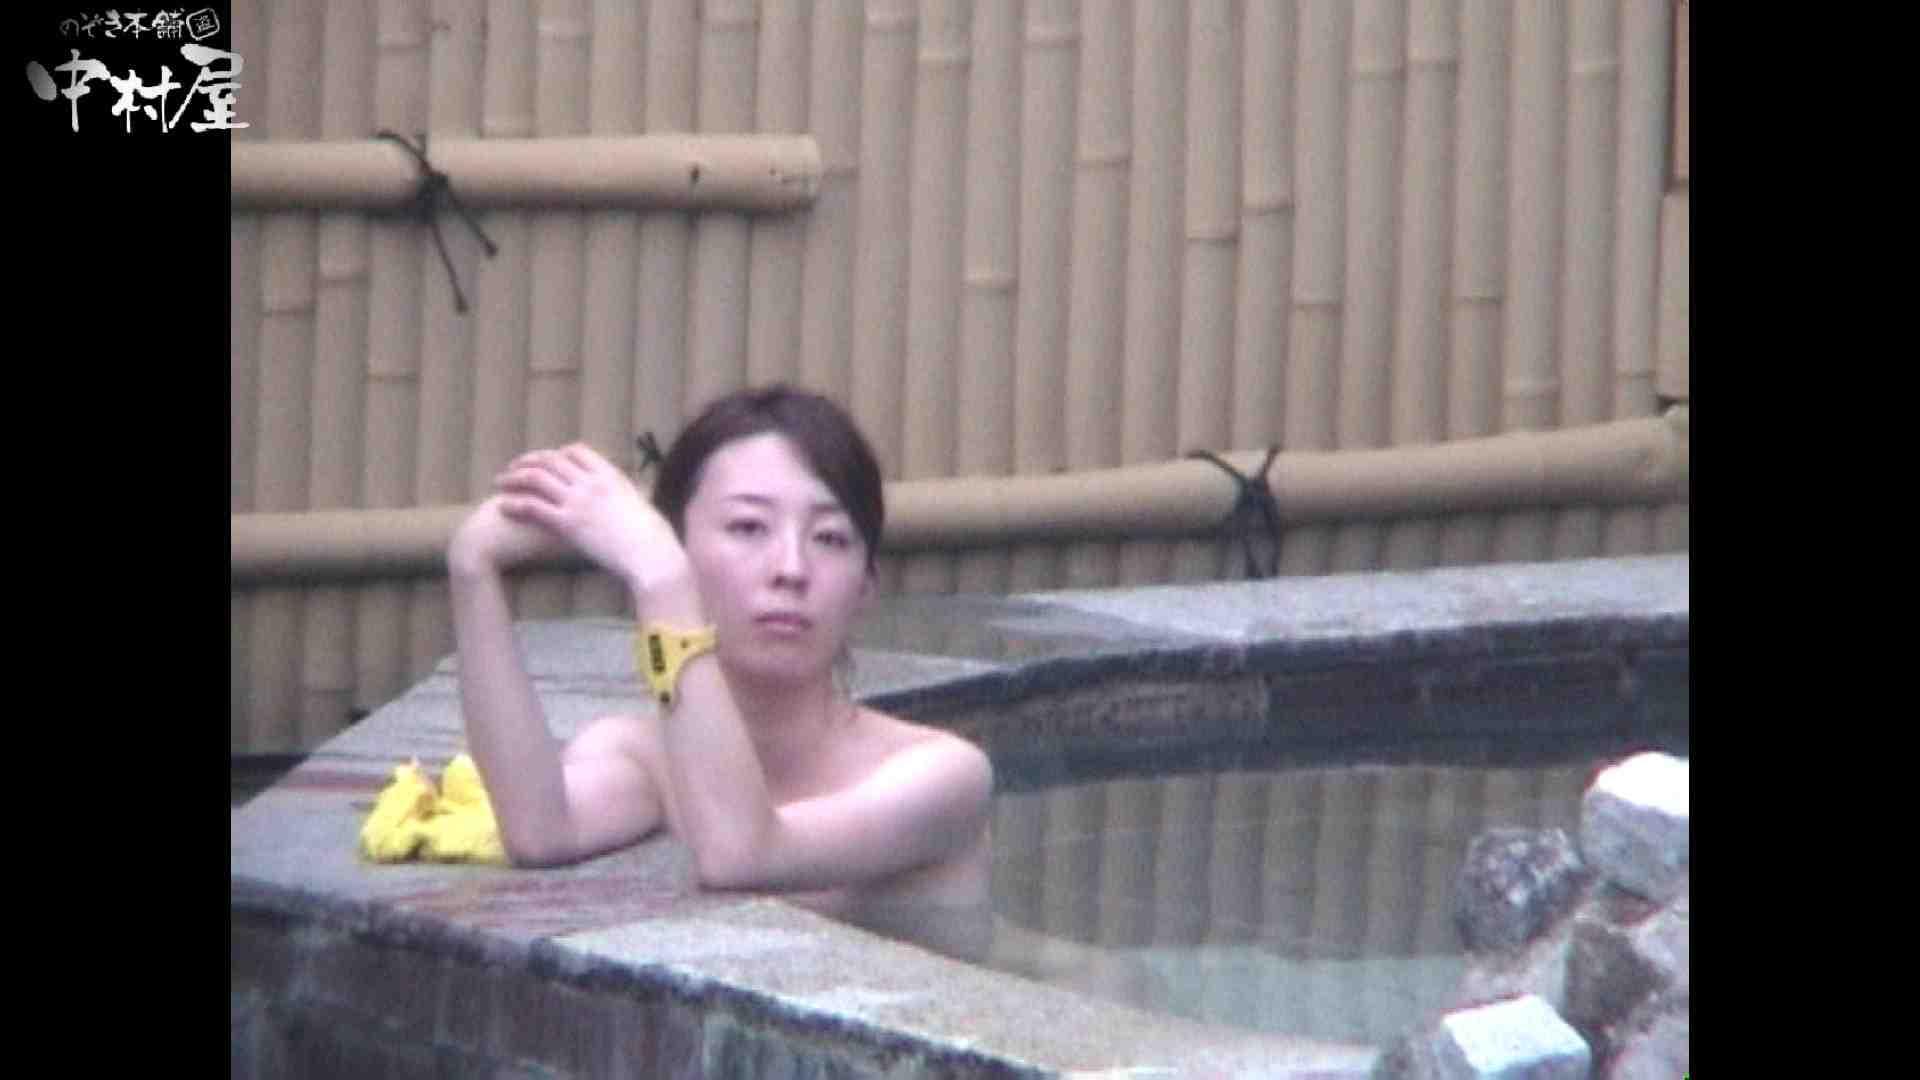 Aquaな露天風呂Vol.964 綺麗なOLたち オメコ無修正動画無料 97枚 80